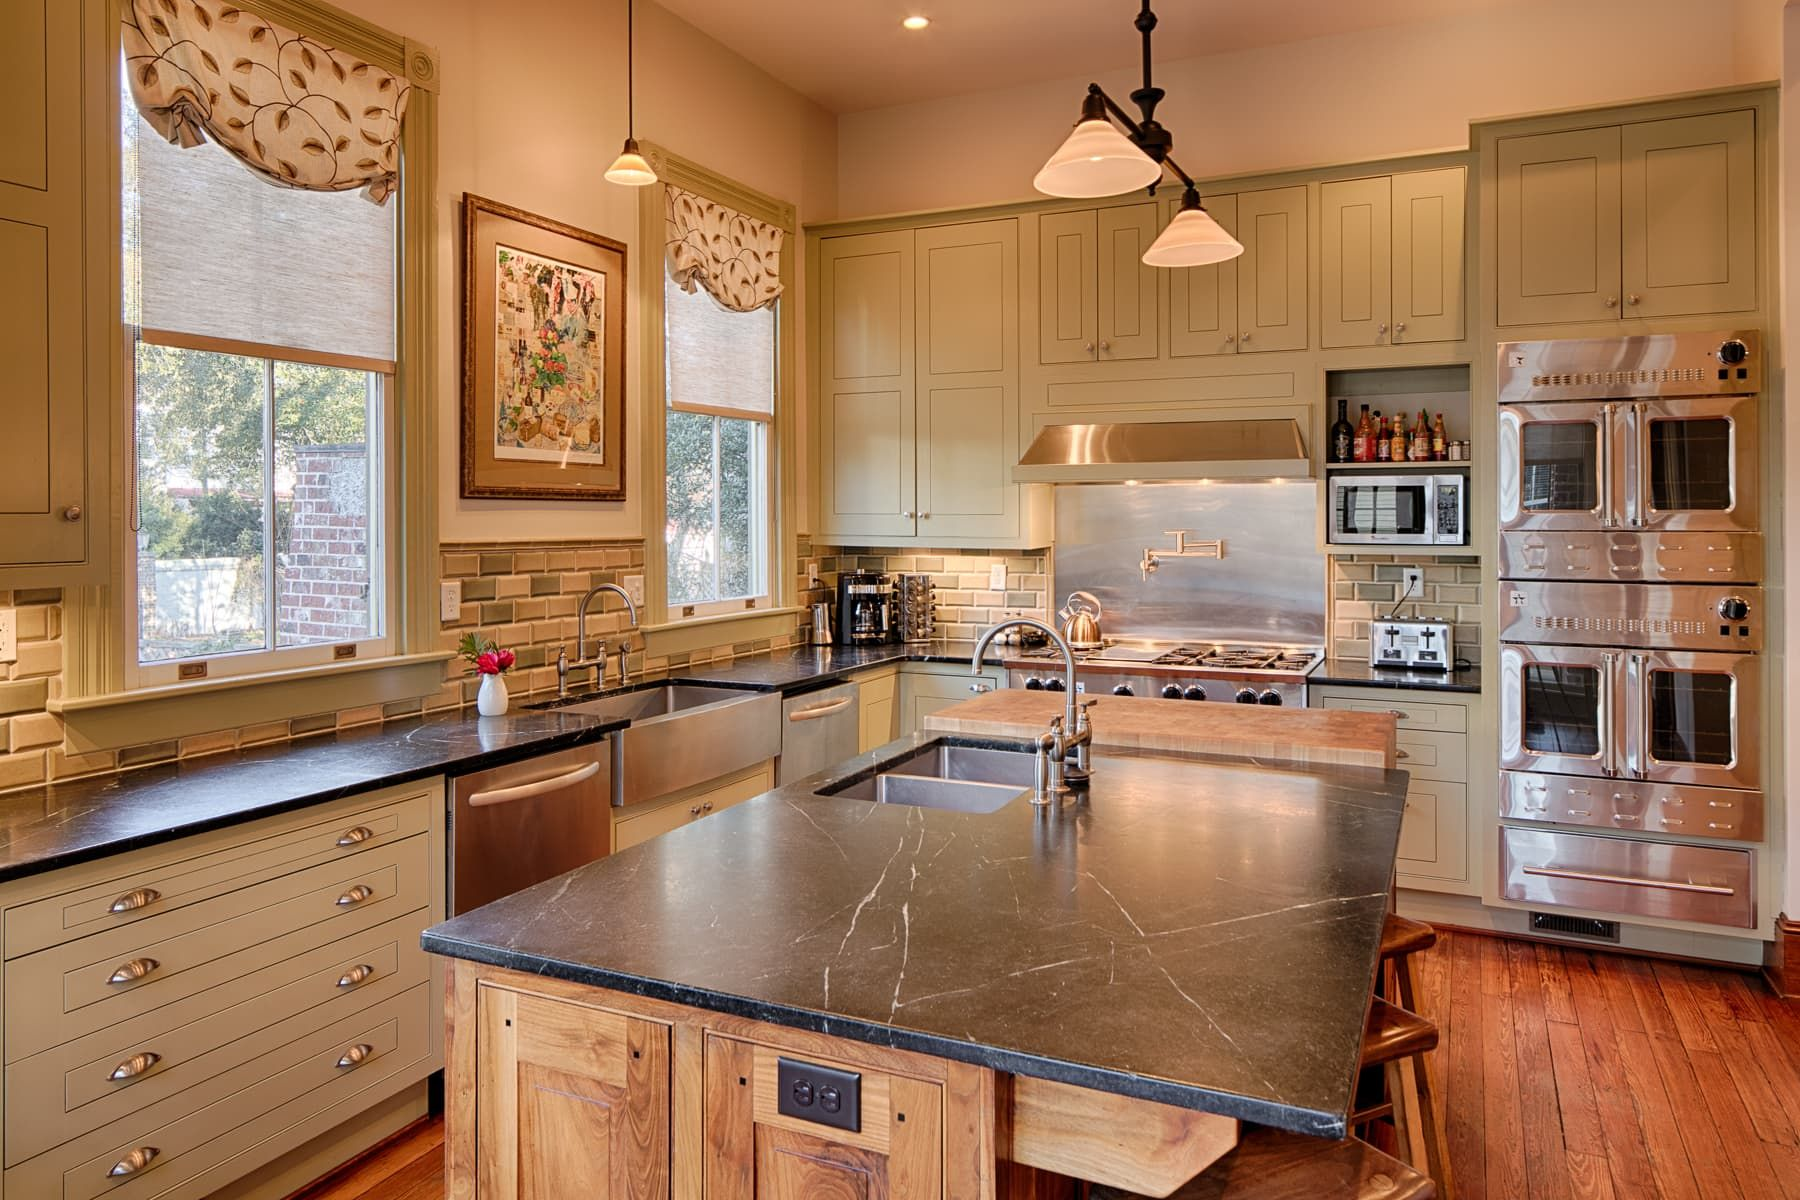 Real Estate Rom Com: History Loves Company in Savannah ...